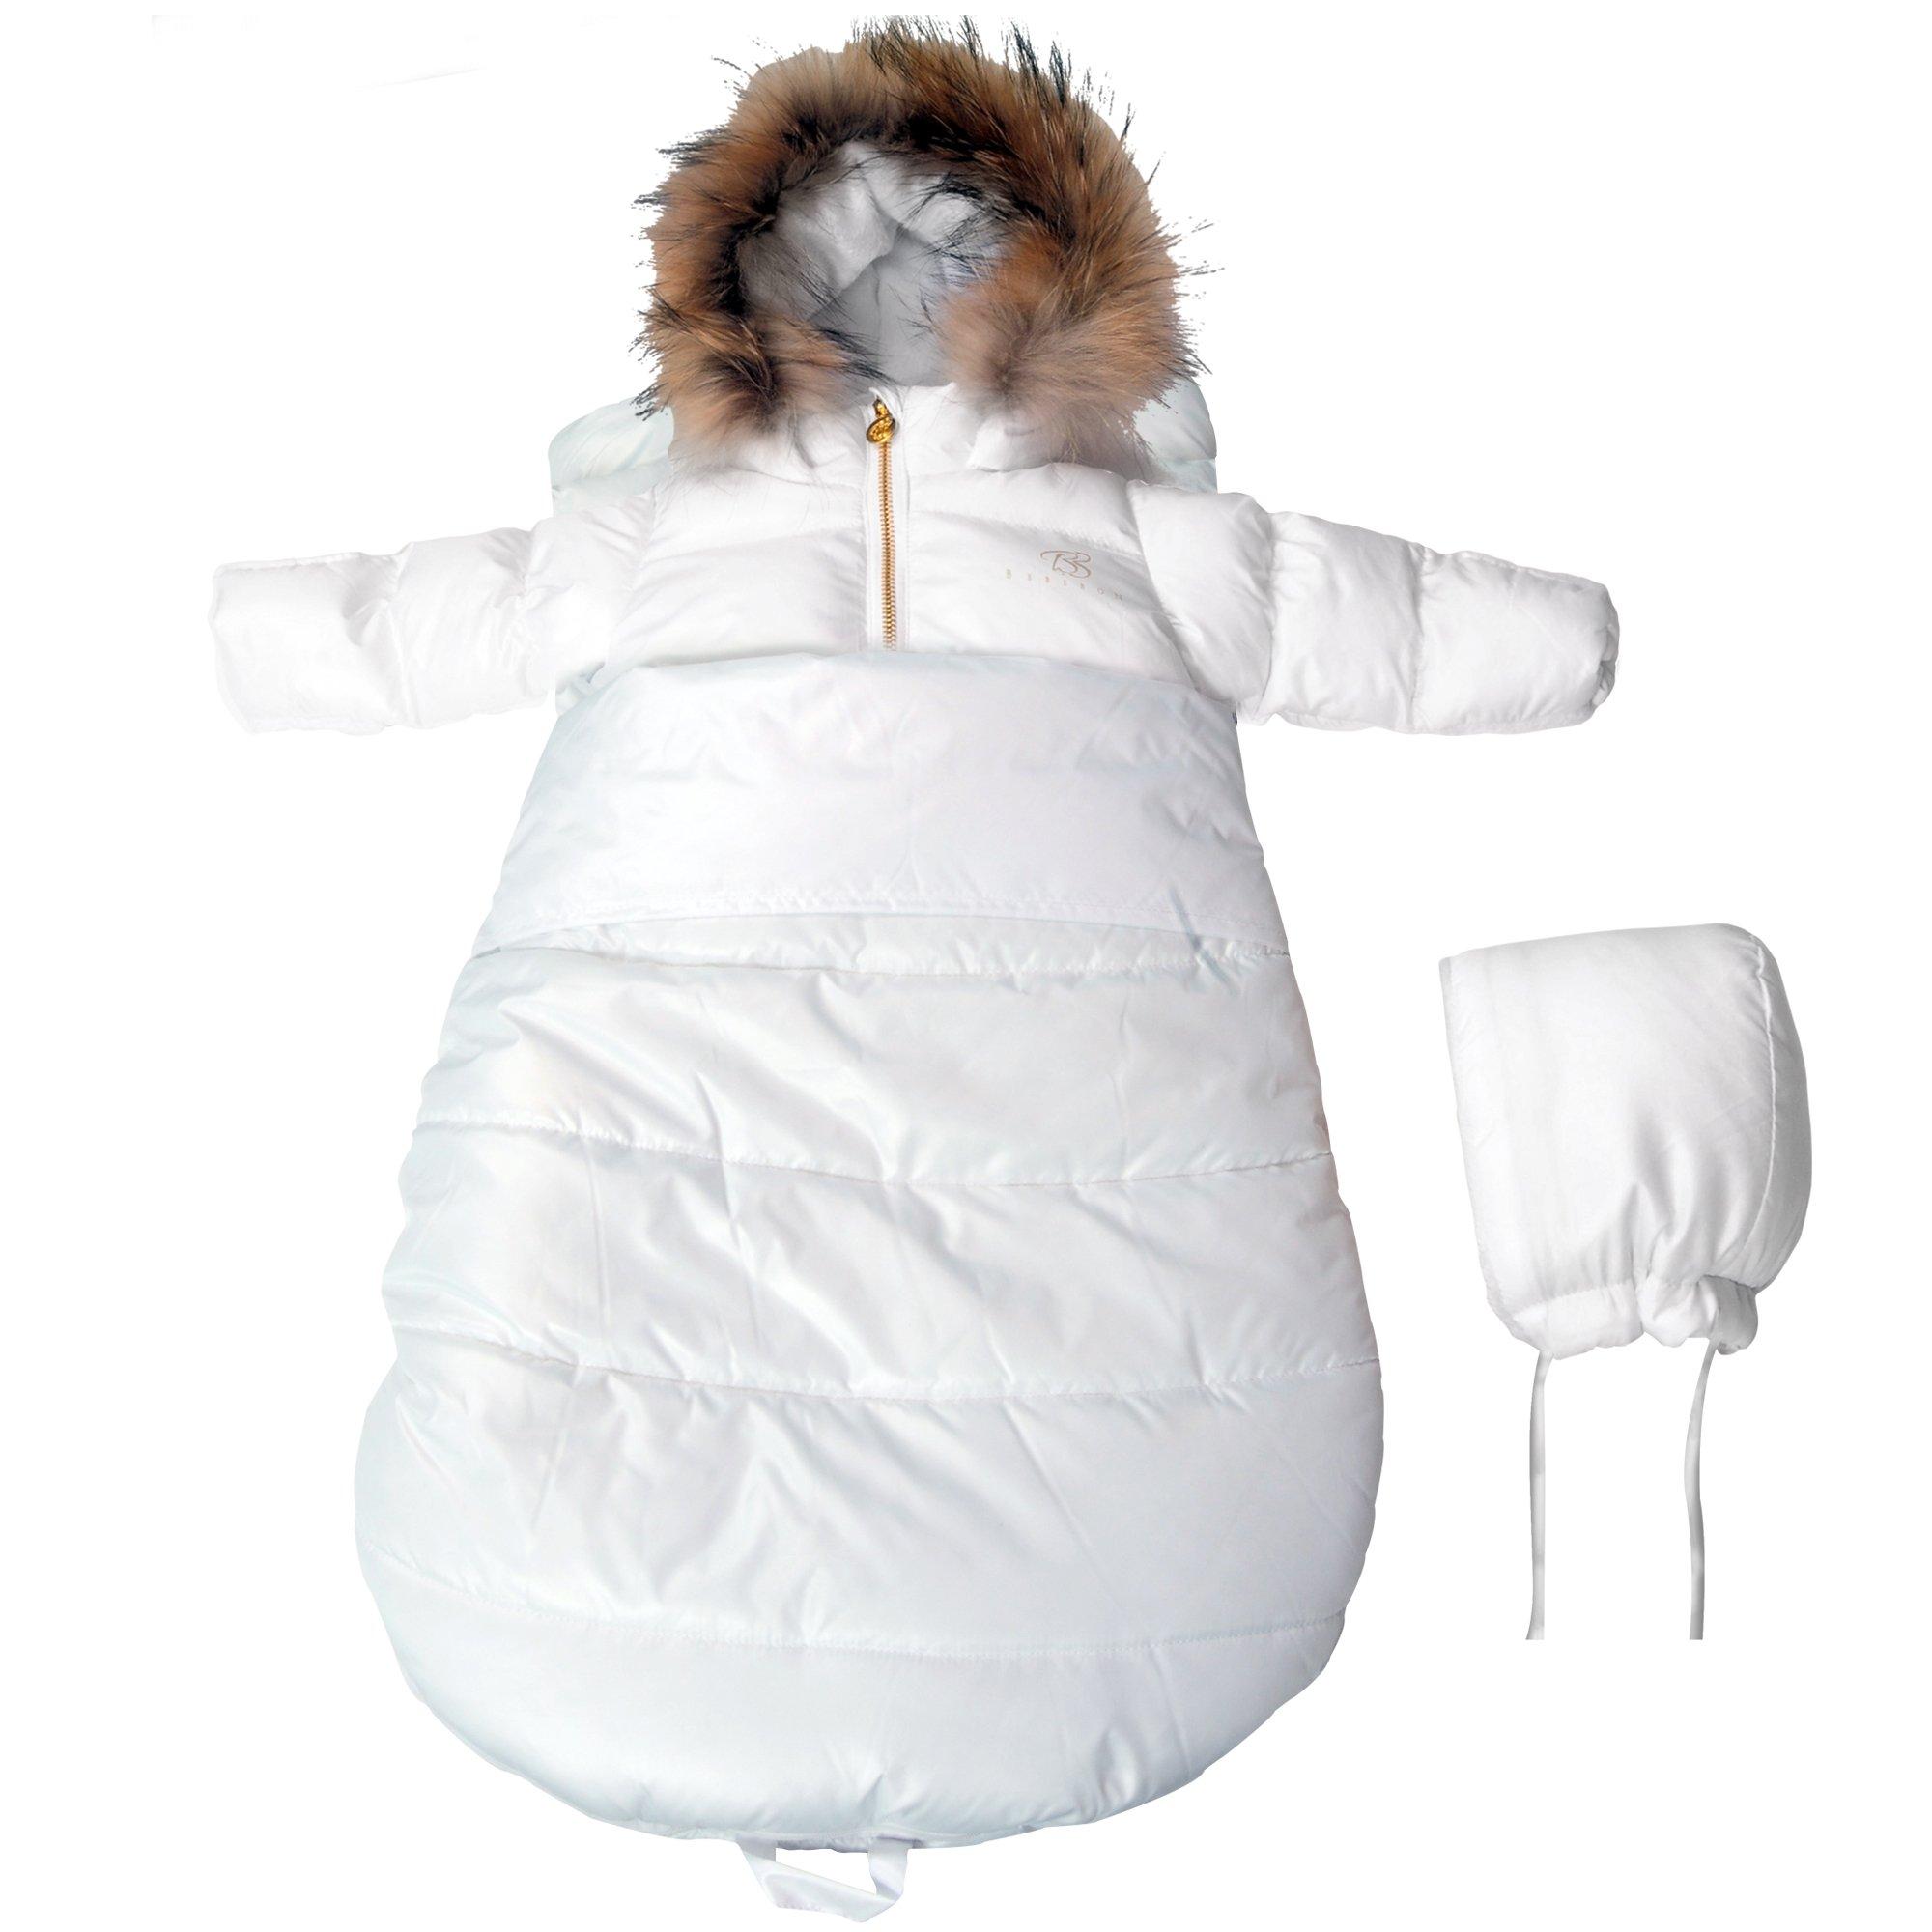 BEBEBON Baby Winter Bunting Set Snowsuit & Stroller Sack White Fur Unisex Newborn